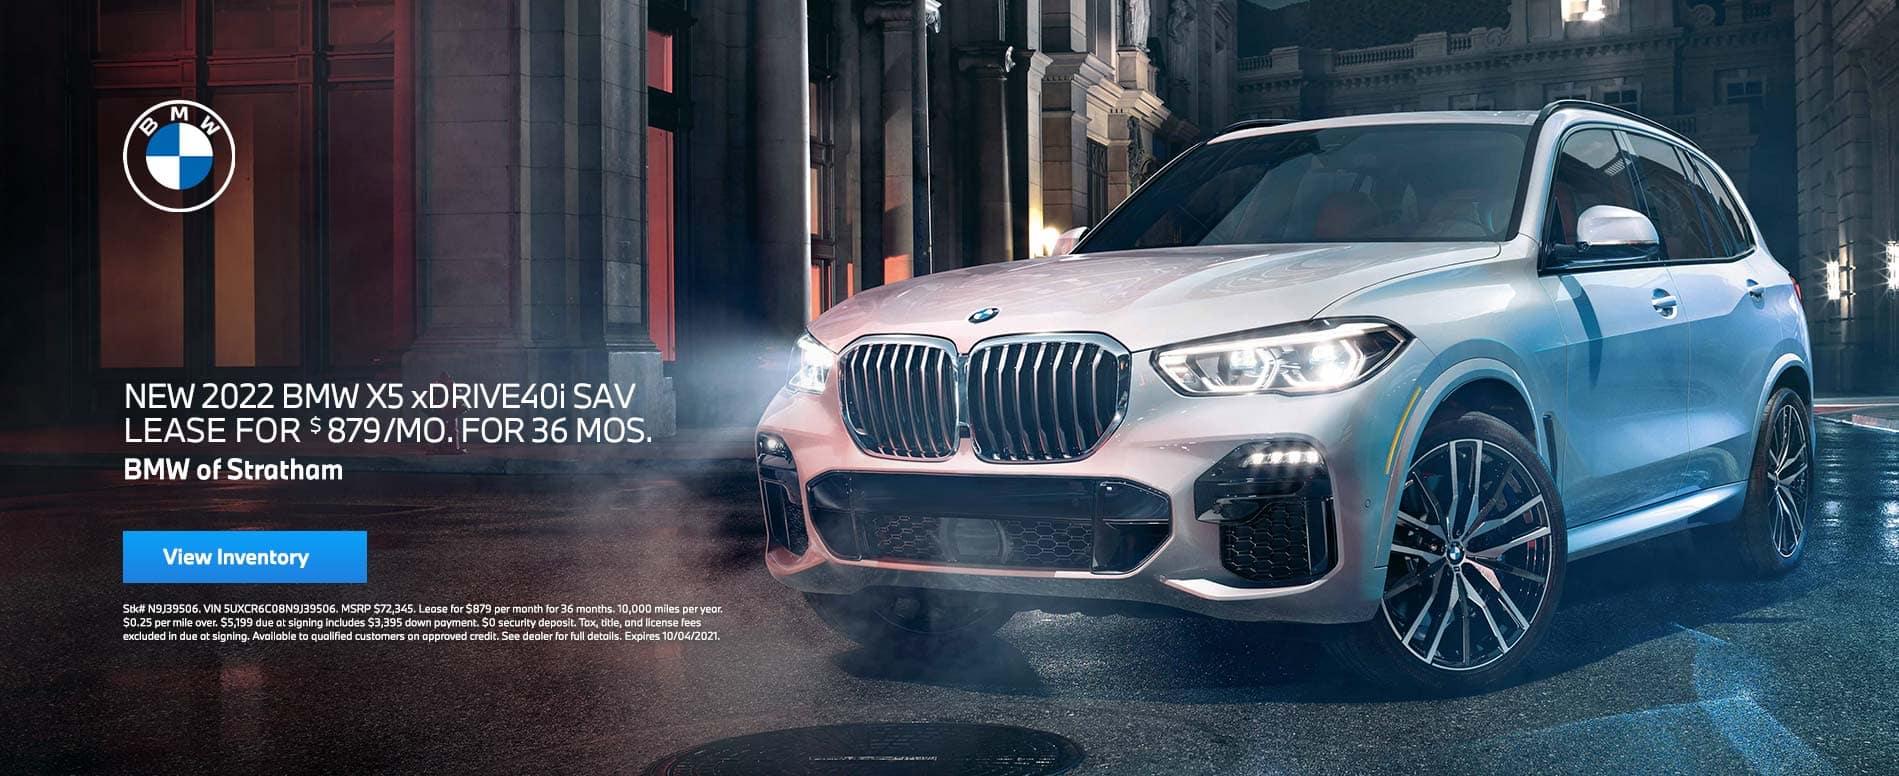 BMWStratham_Slide_1990x776_X5_9-21